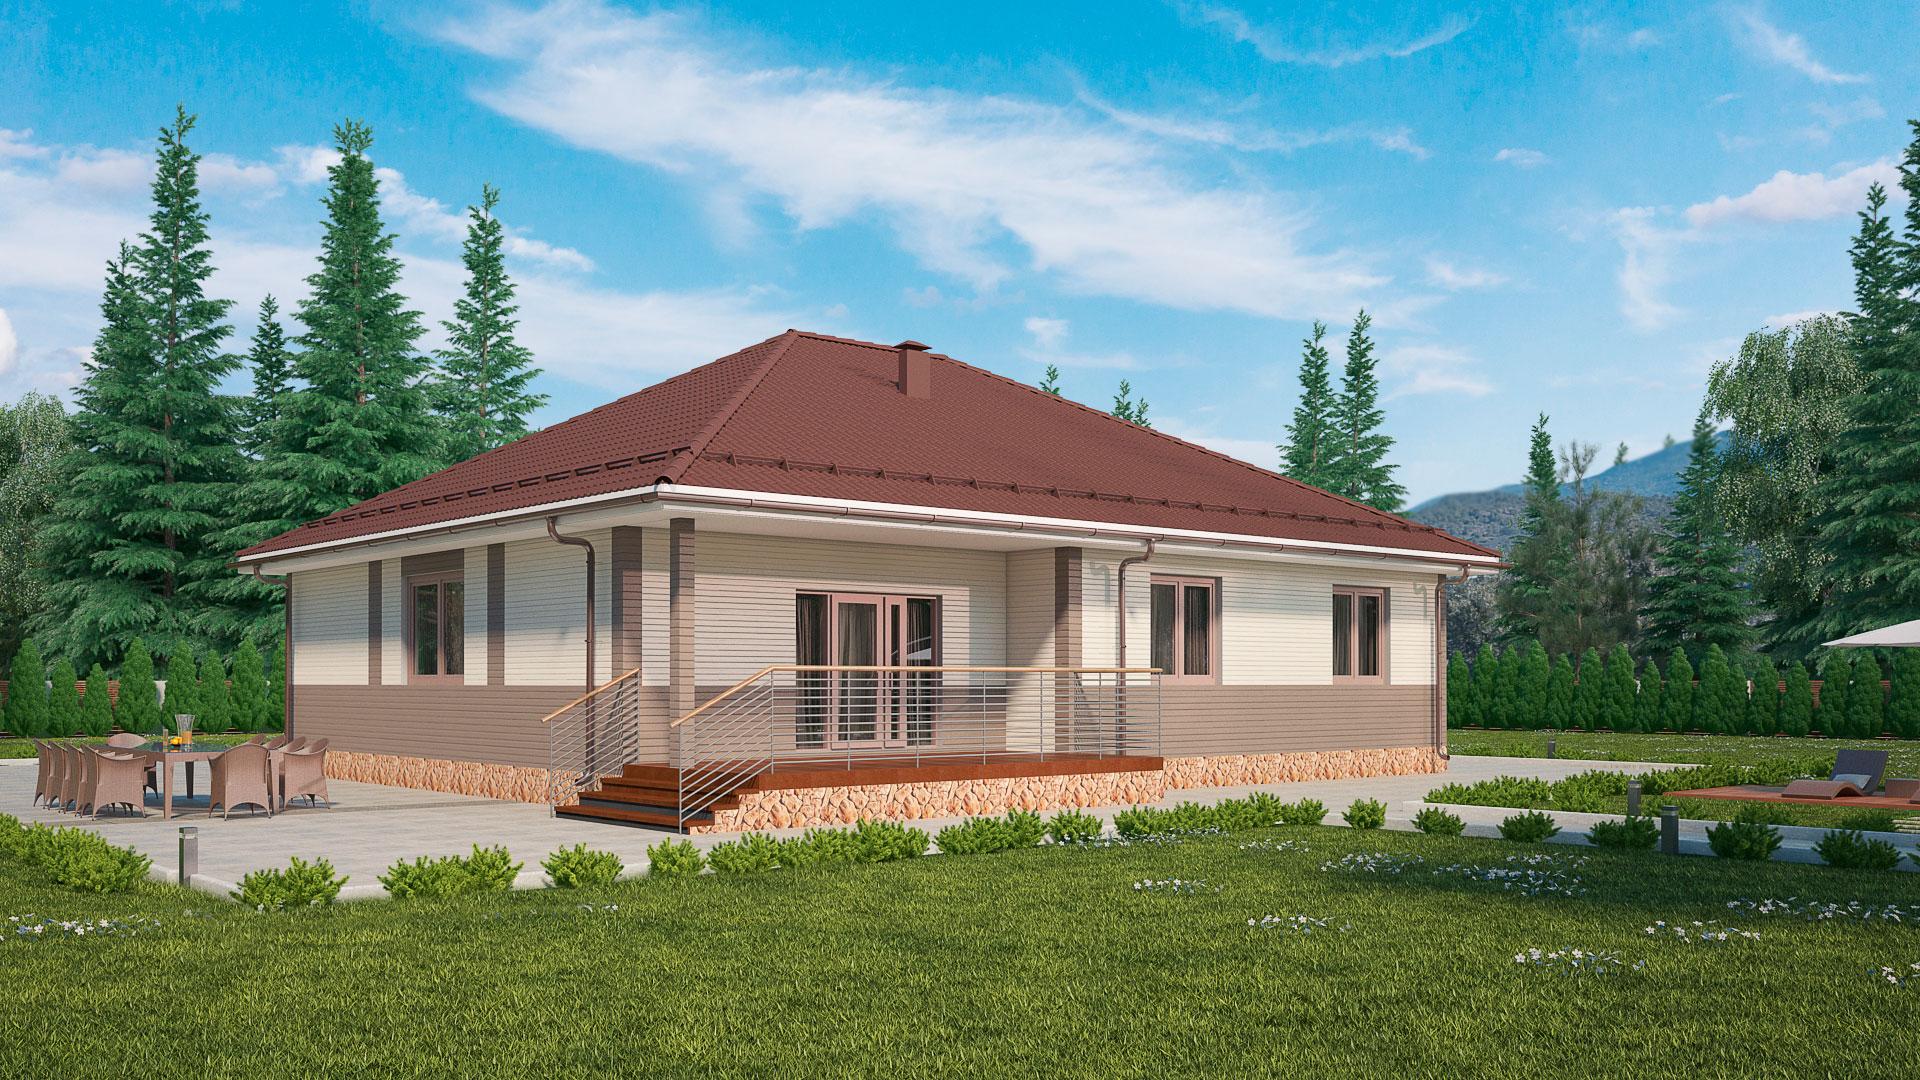 Задний фасад одноэтажного дома с верандой, проект БЭНПАН МС-178.